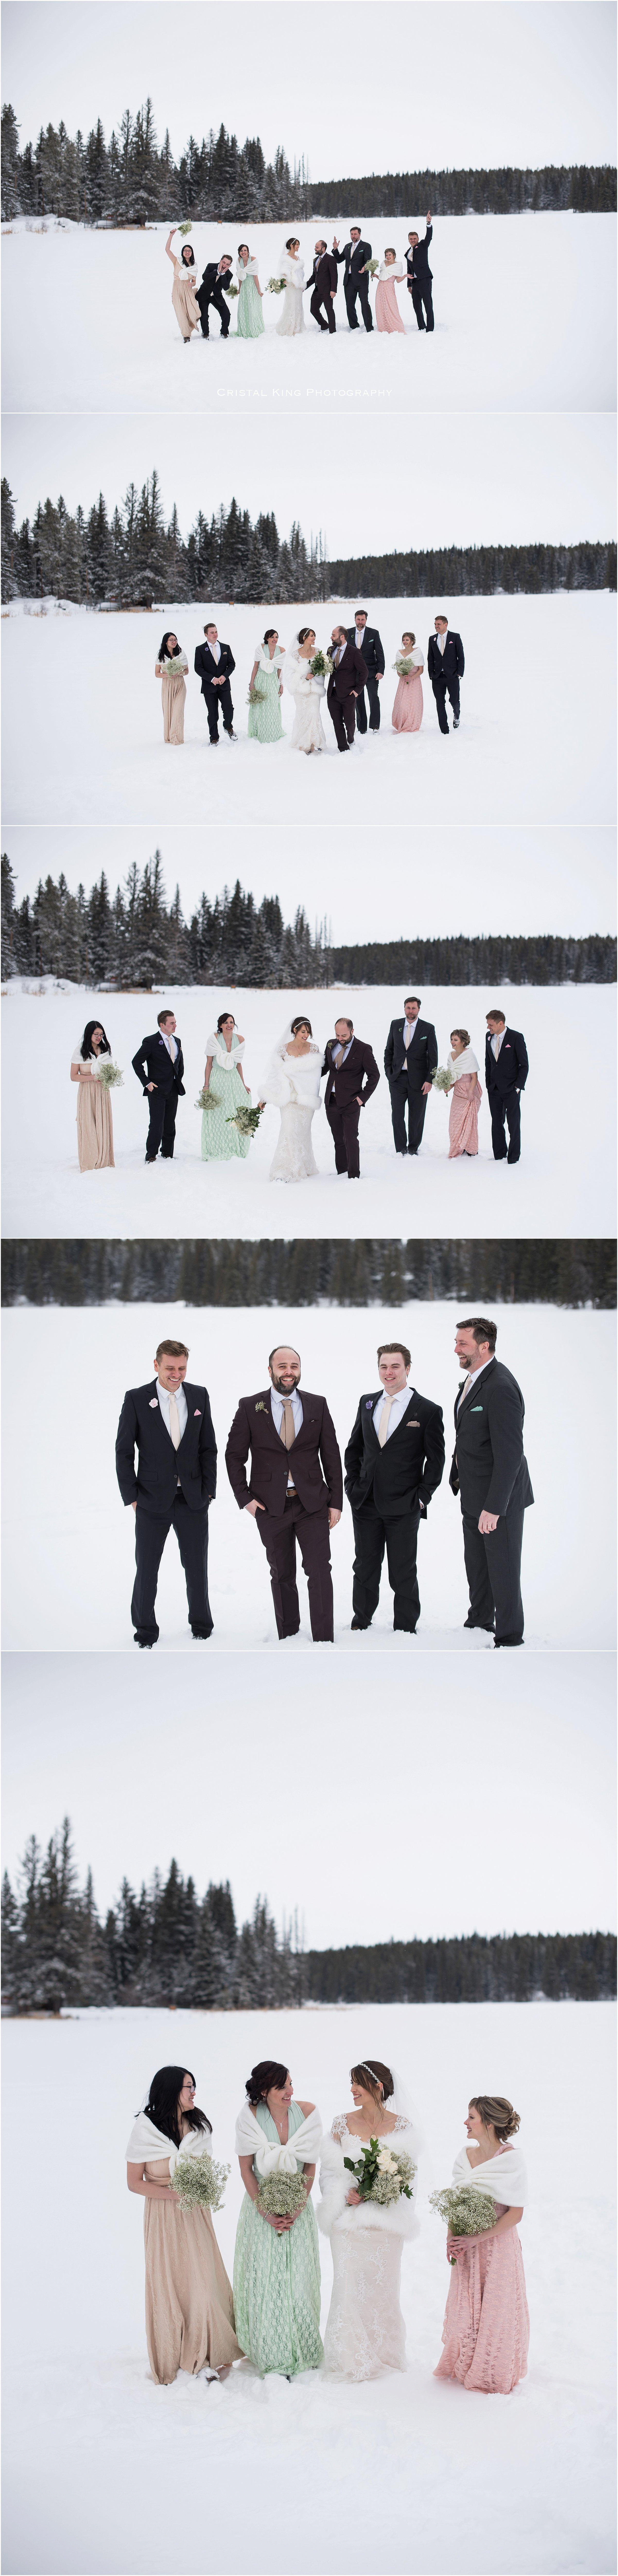 Jacqueline-Jasons-Wedding-102.jpg